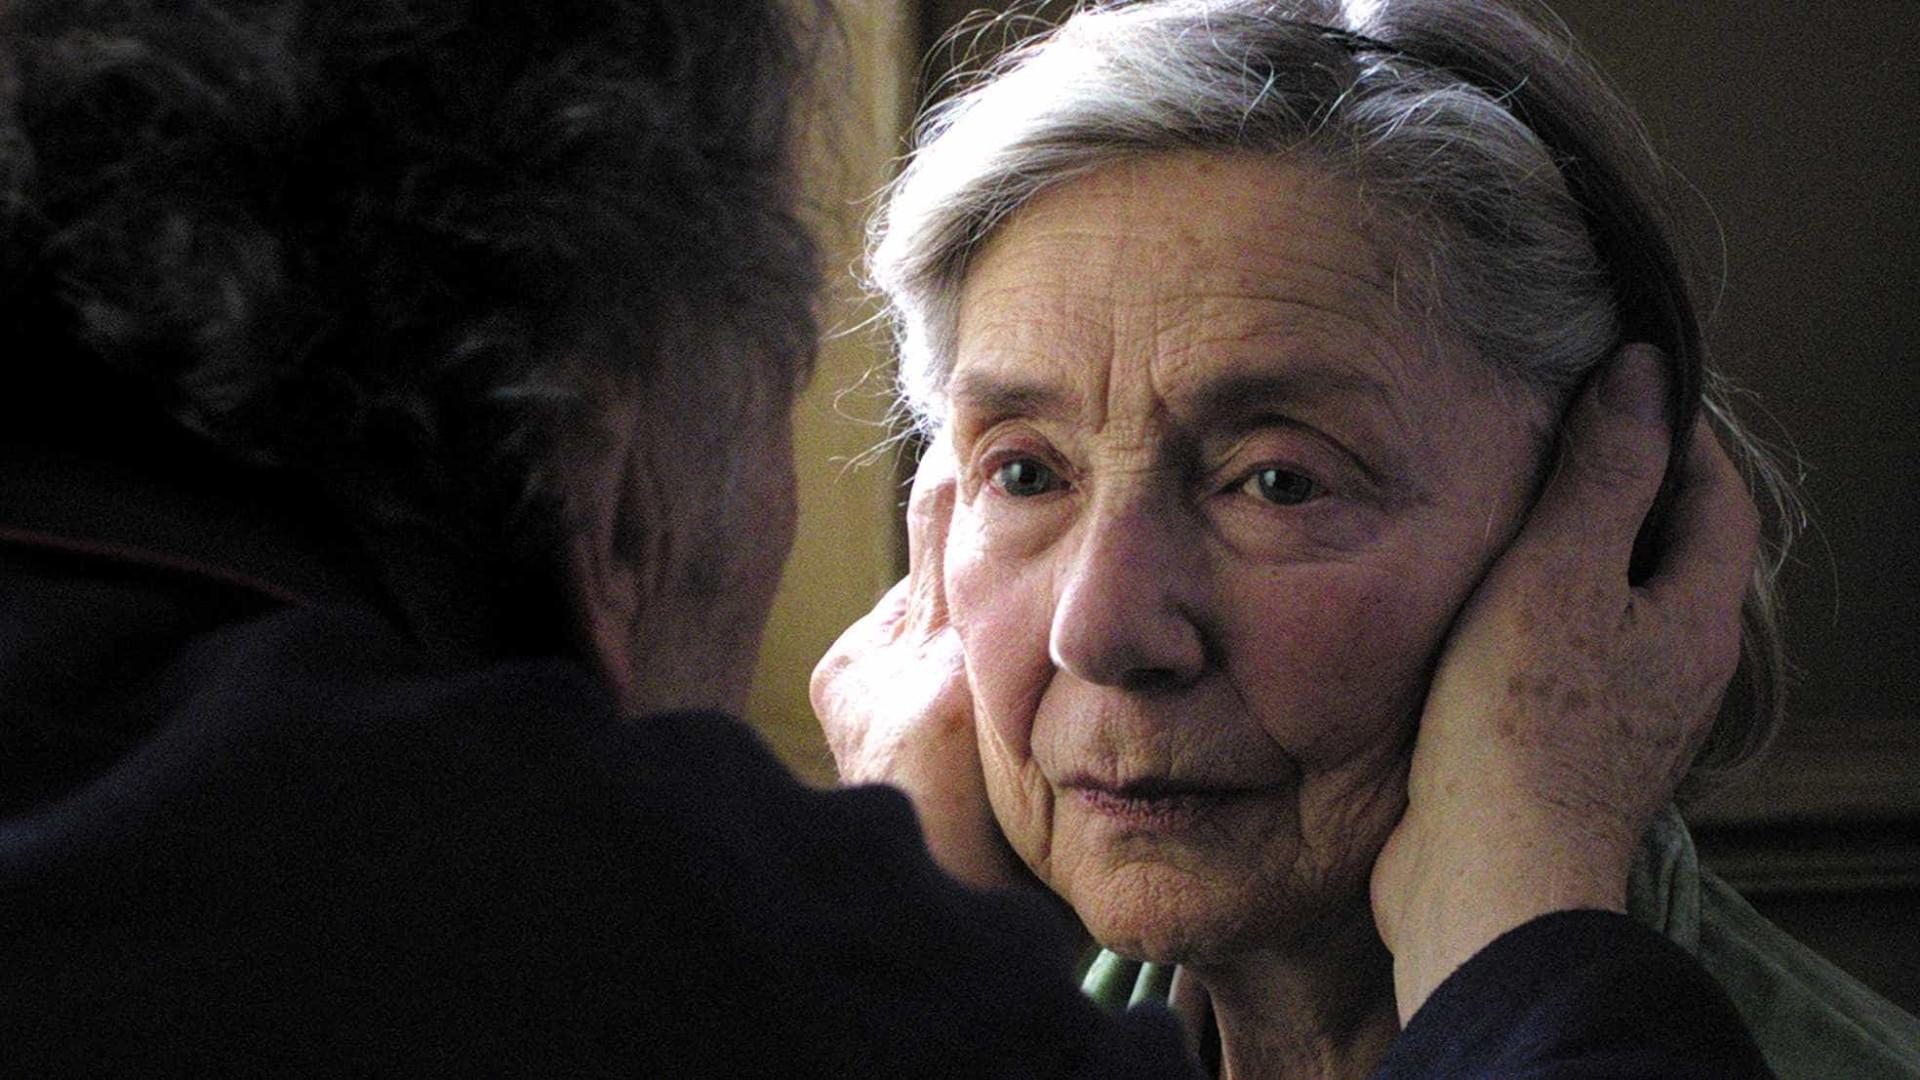 Ciclo de Cinema e Psicanálise debate o filme 'Amor', de Haneke